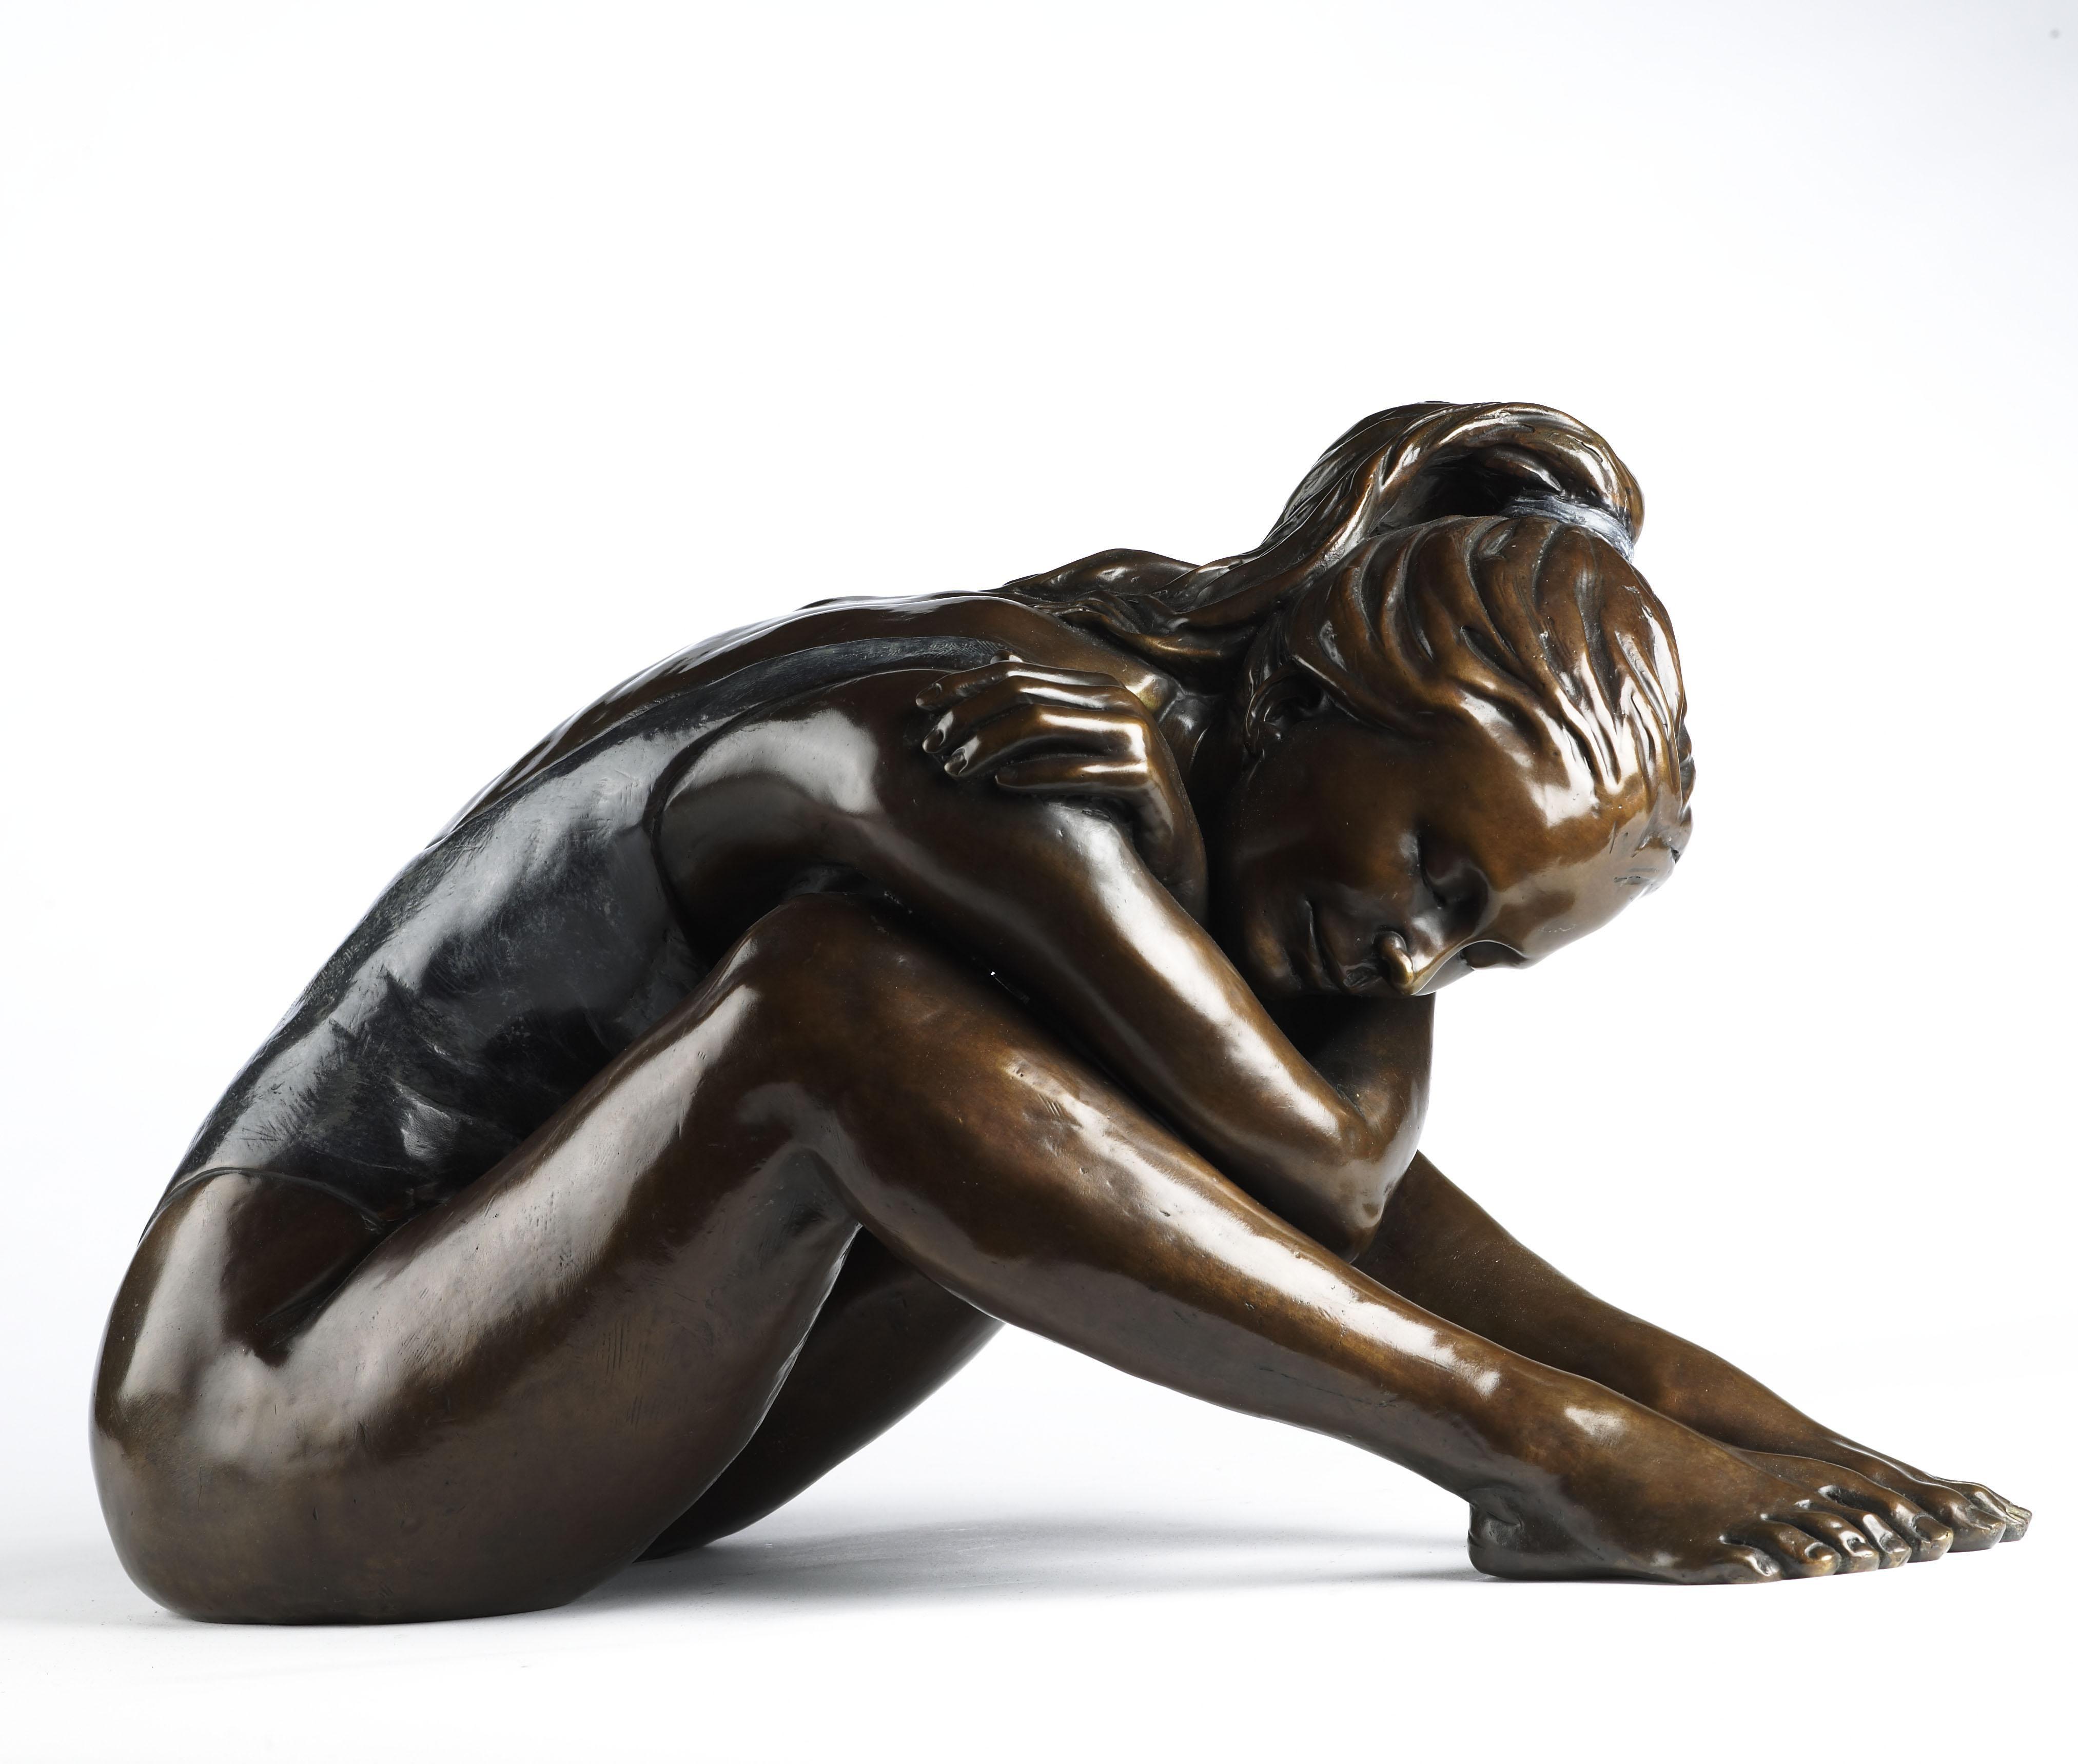 Olympiad. A bronze sculpture of a resting ballet dancer figure by Benson Landes